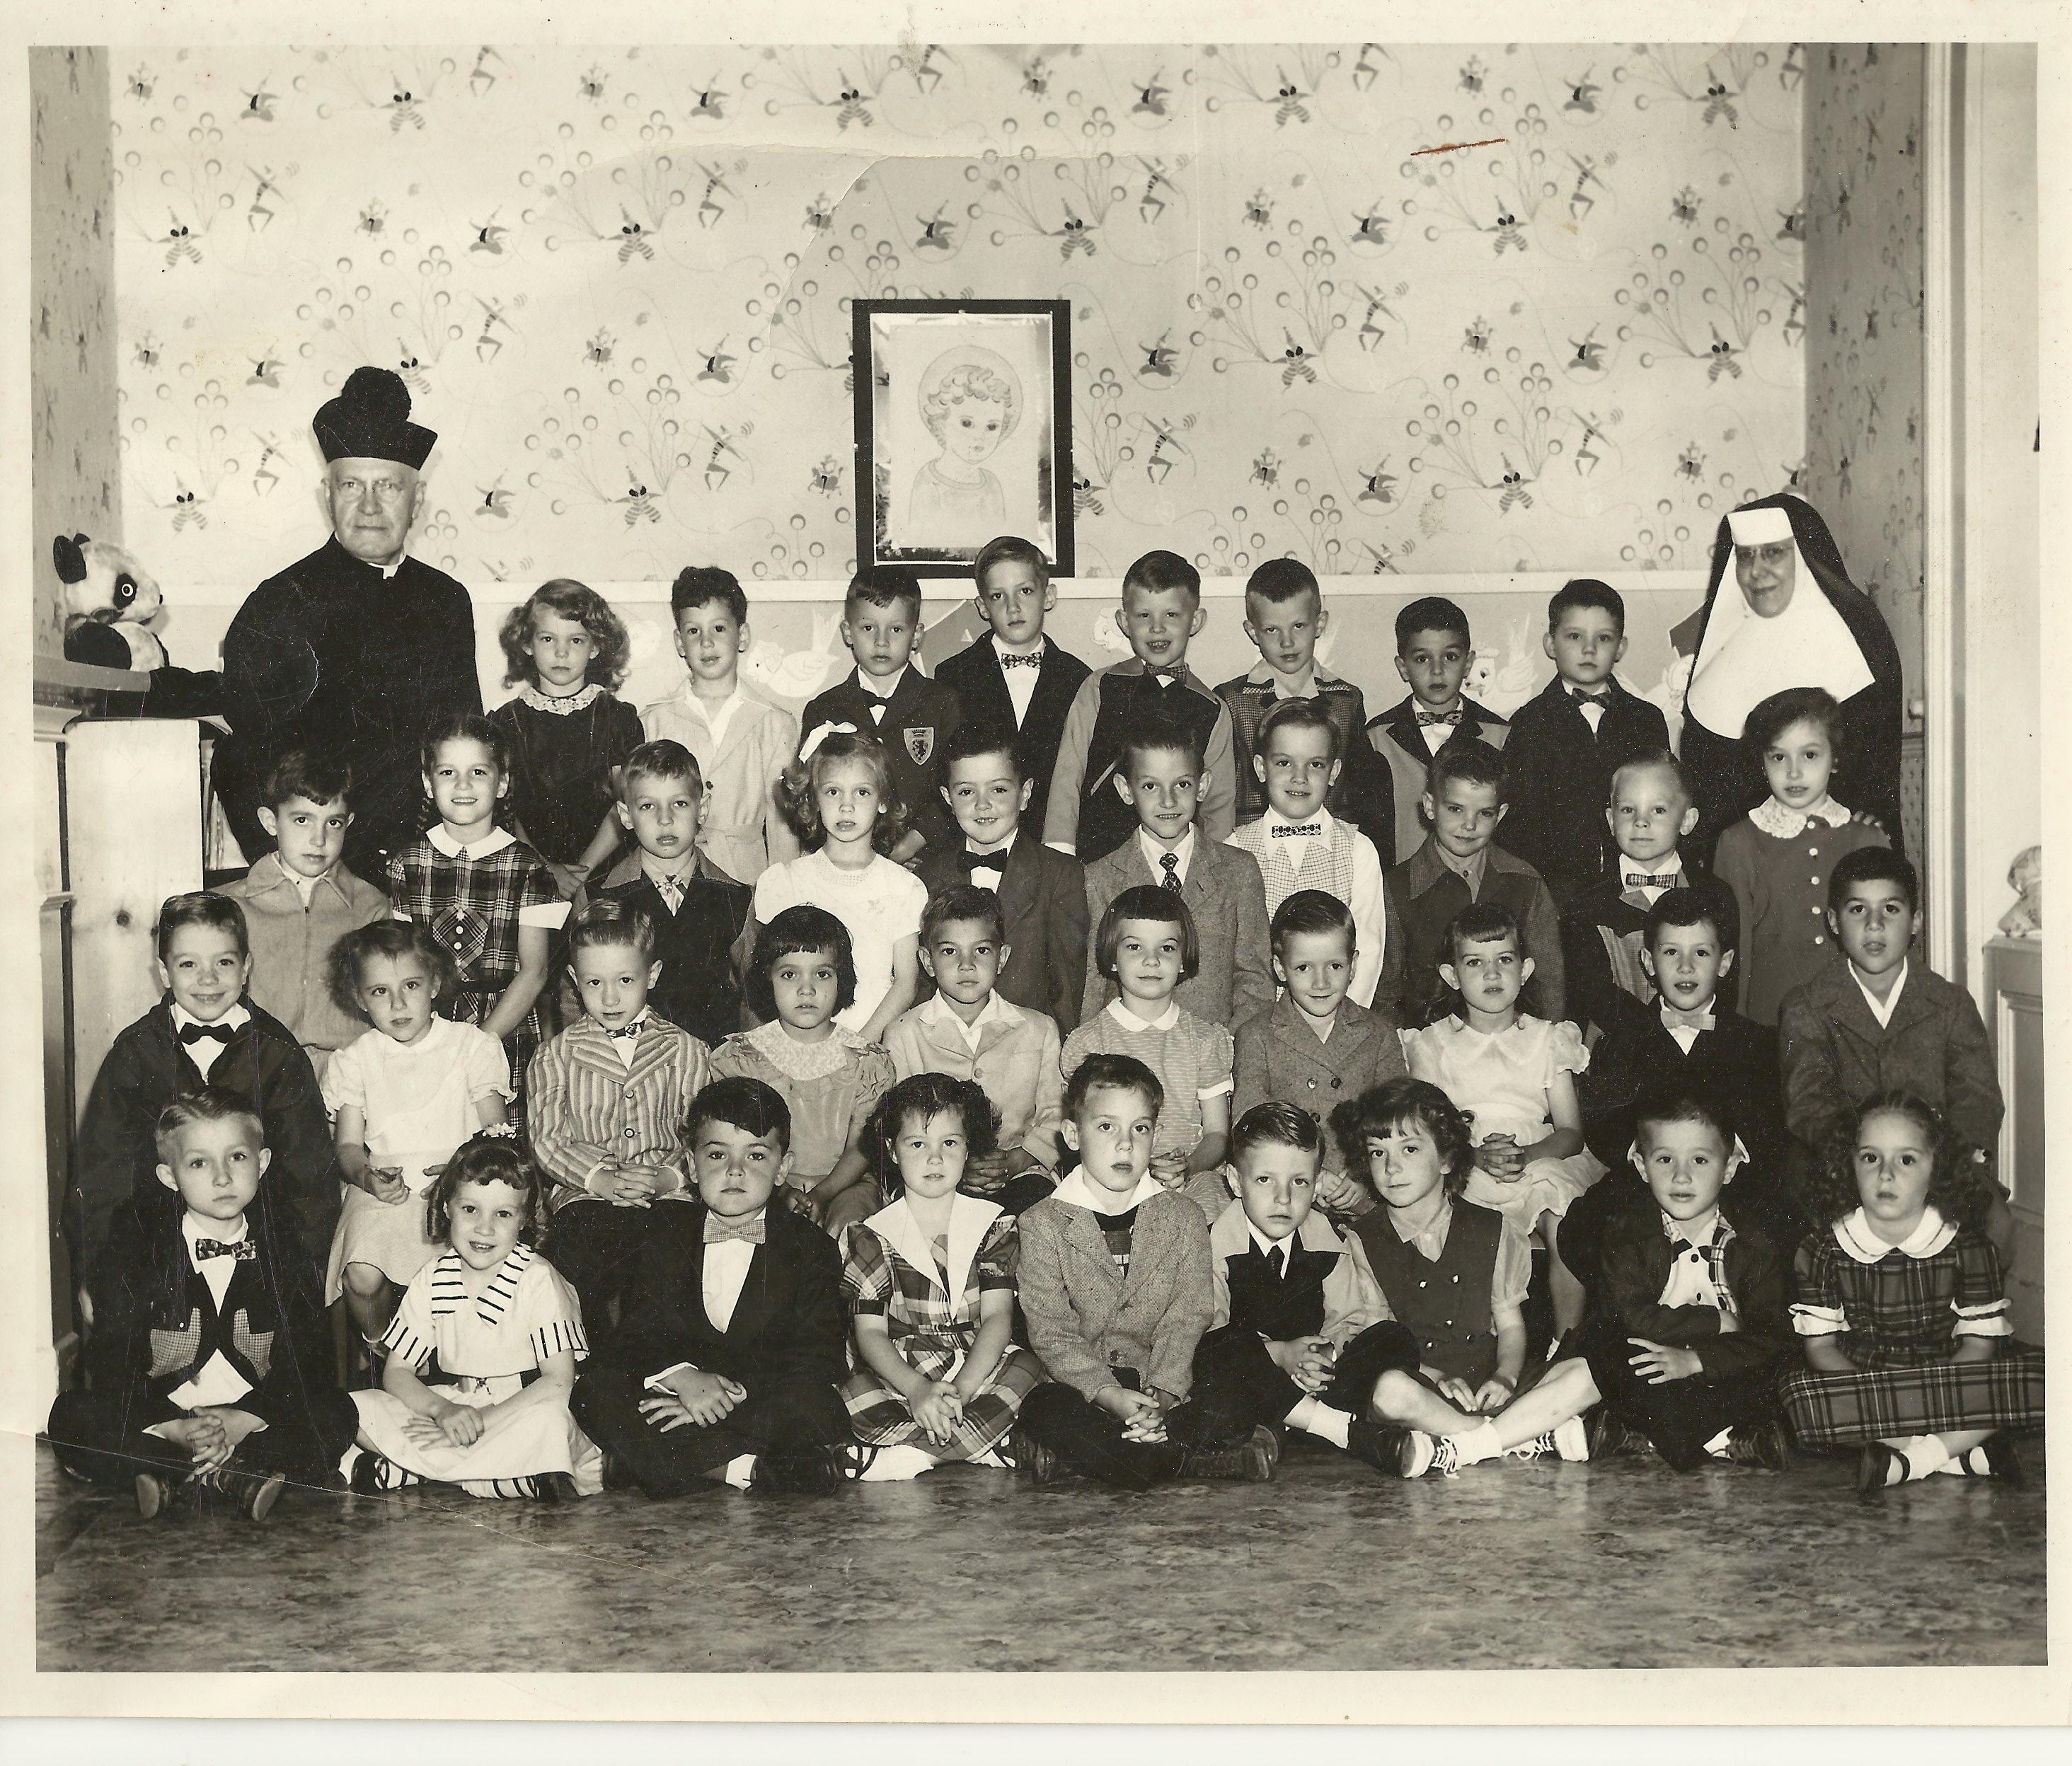 Kidergarten class, St. Peter & Paul School, 1952-53. Msgr. Linus Kipping (1864-1960). left; Mother Perpetua, right. (Photo courtesy Charles Tisckos)